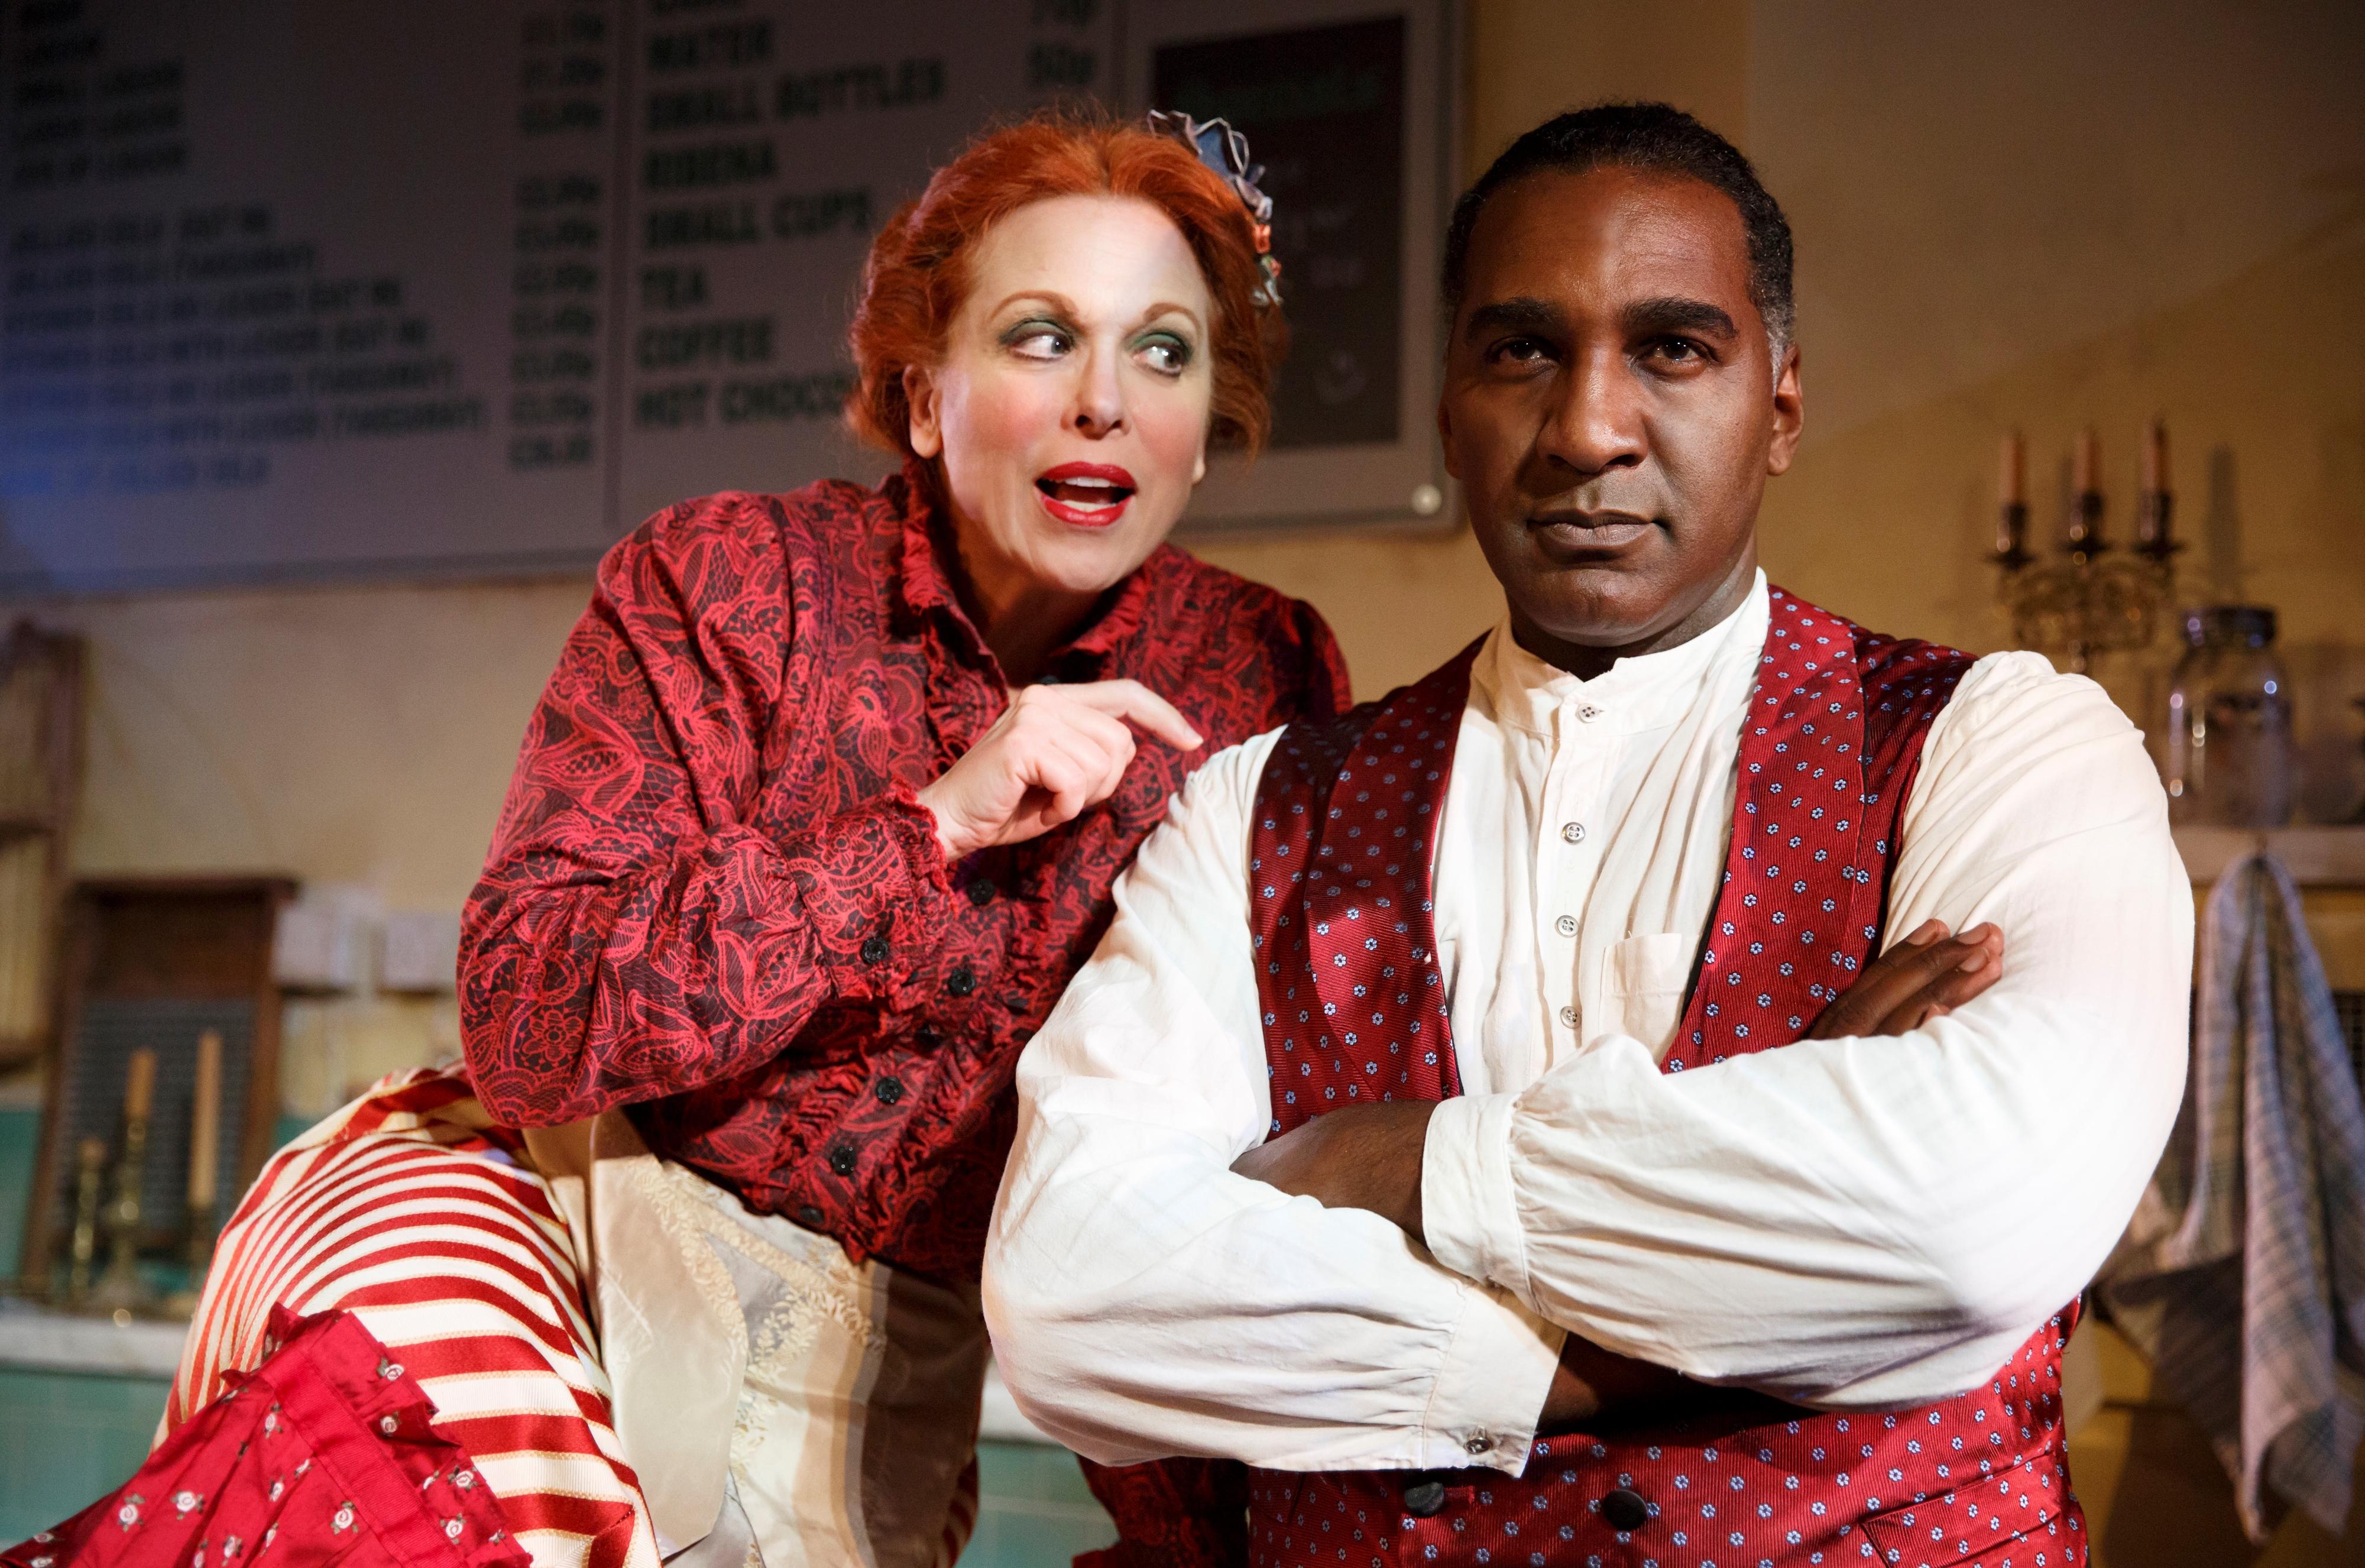 Theater Review: 'Sweeney Todd: The Demon Barber of Fleet Street'